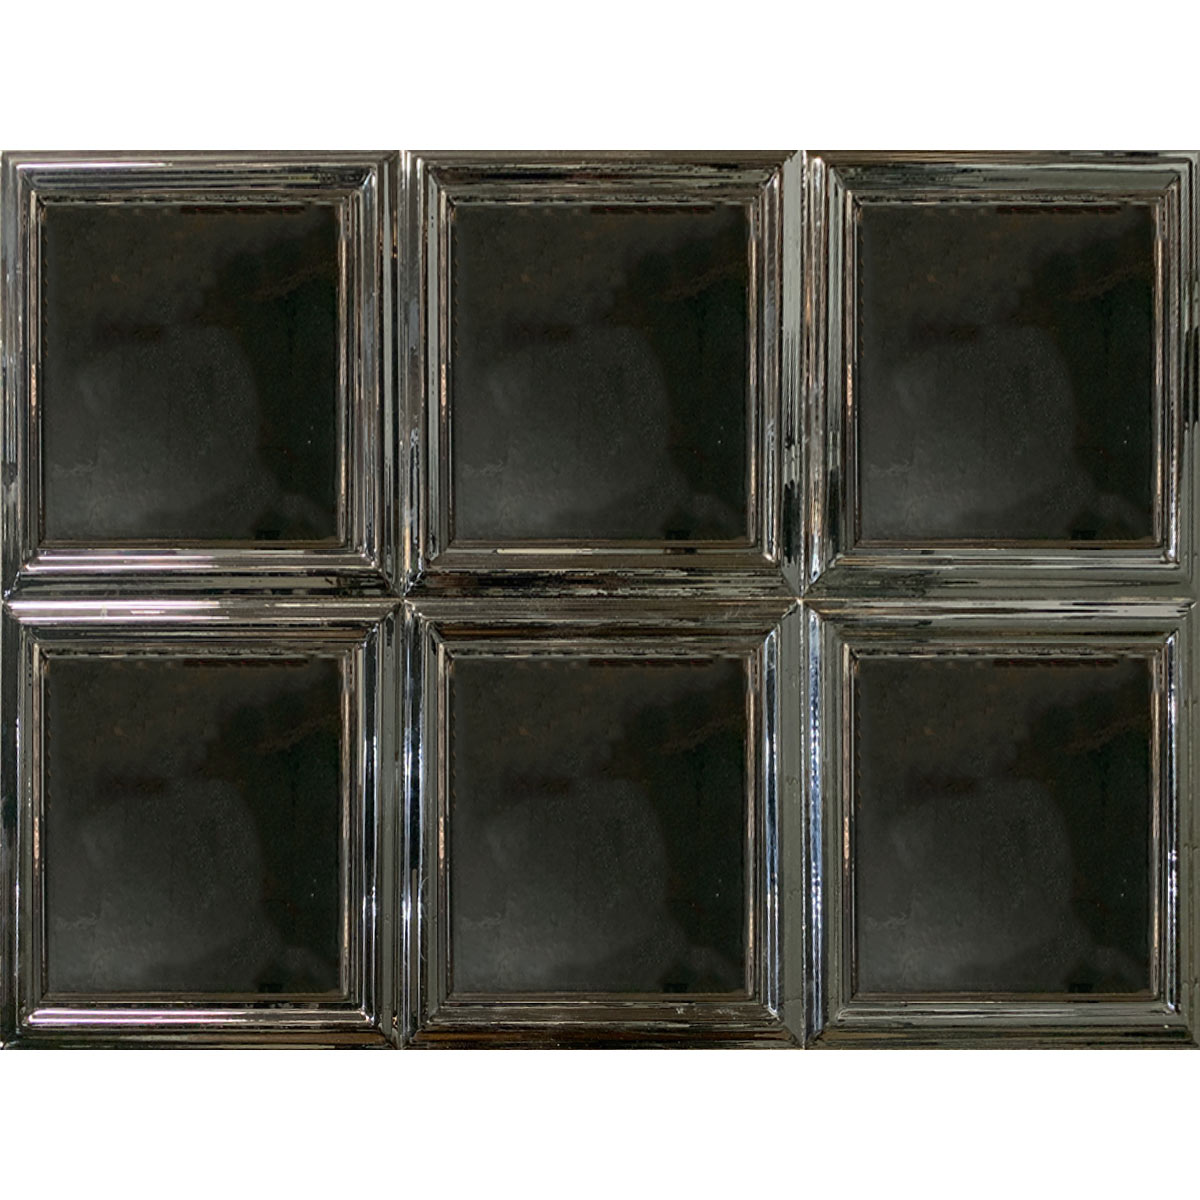 D00092 BOLD 3D BLACK GLOSSY